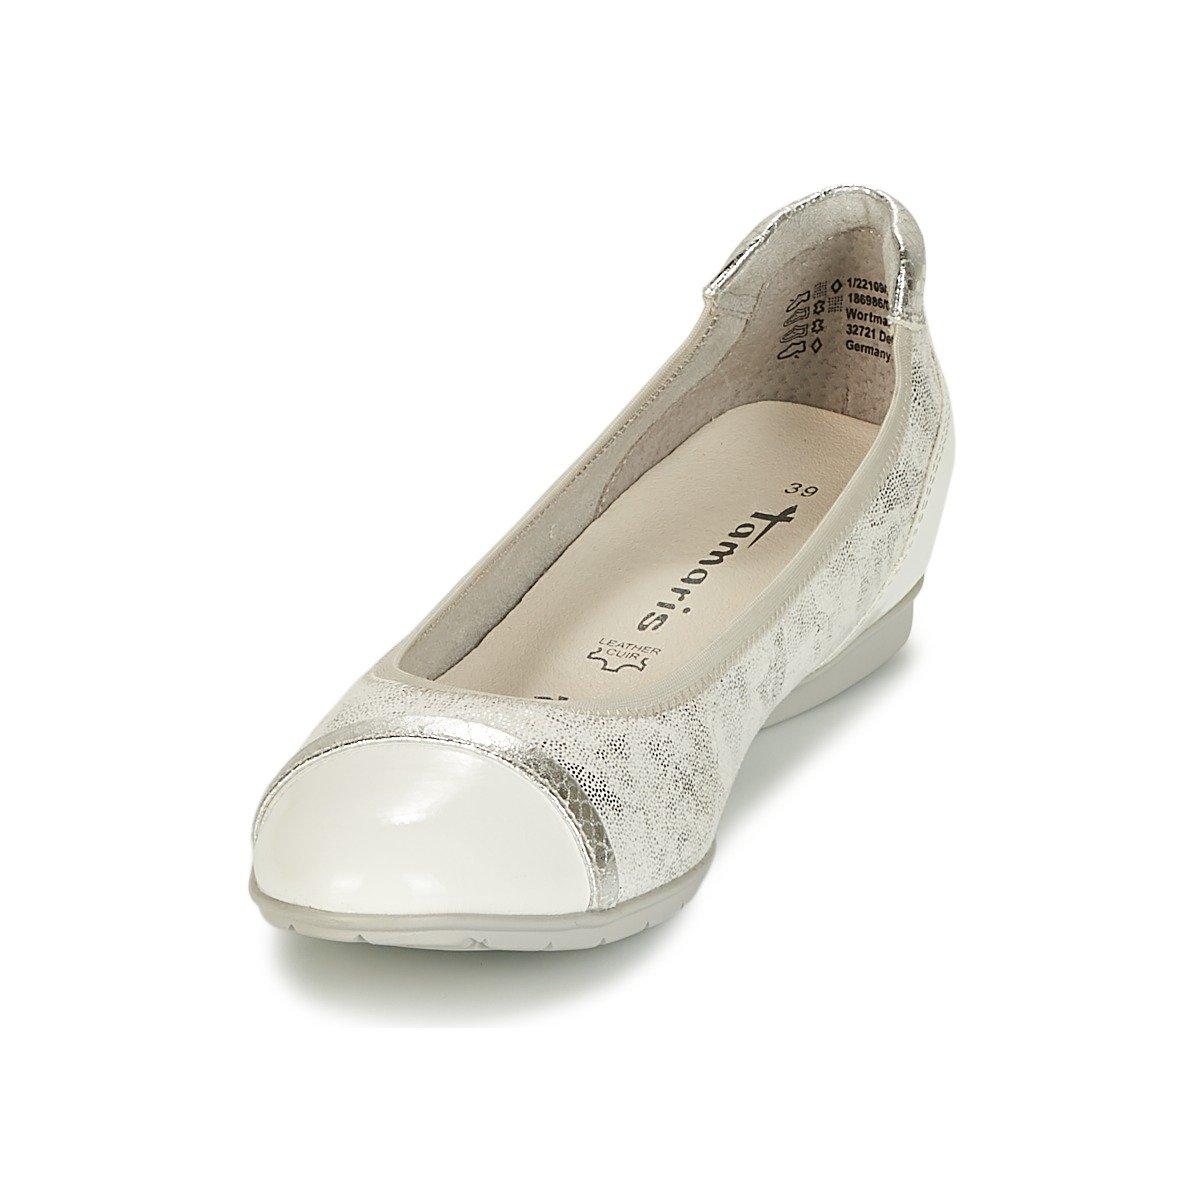 Tamaris Damen Ballerinas 417145 1-1-22109-20/197 weiß 417145 Ballerinas 529cf0